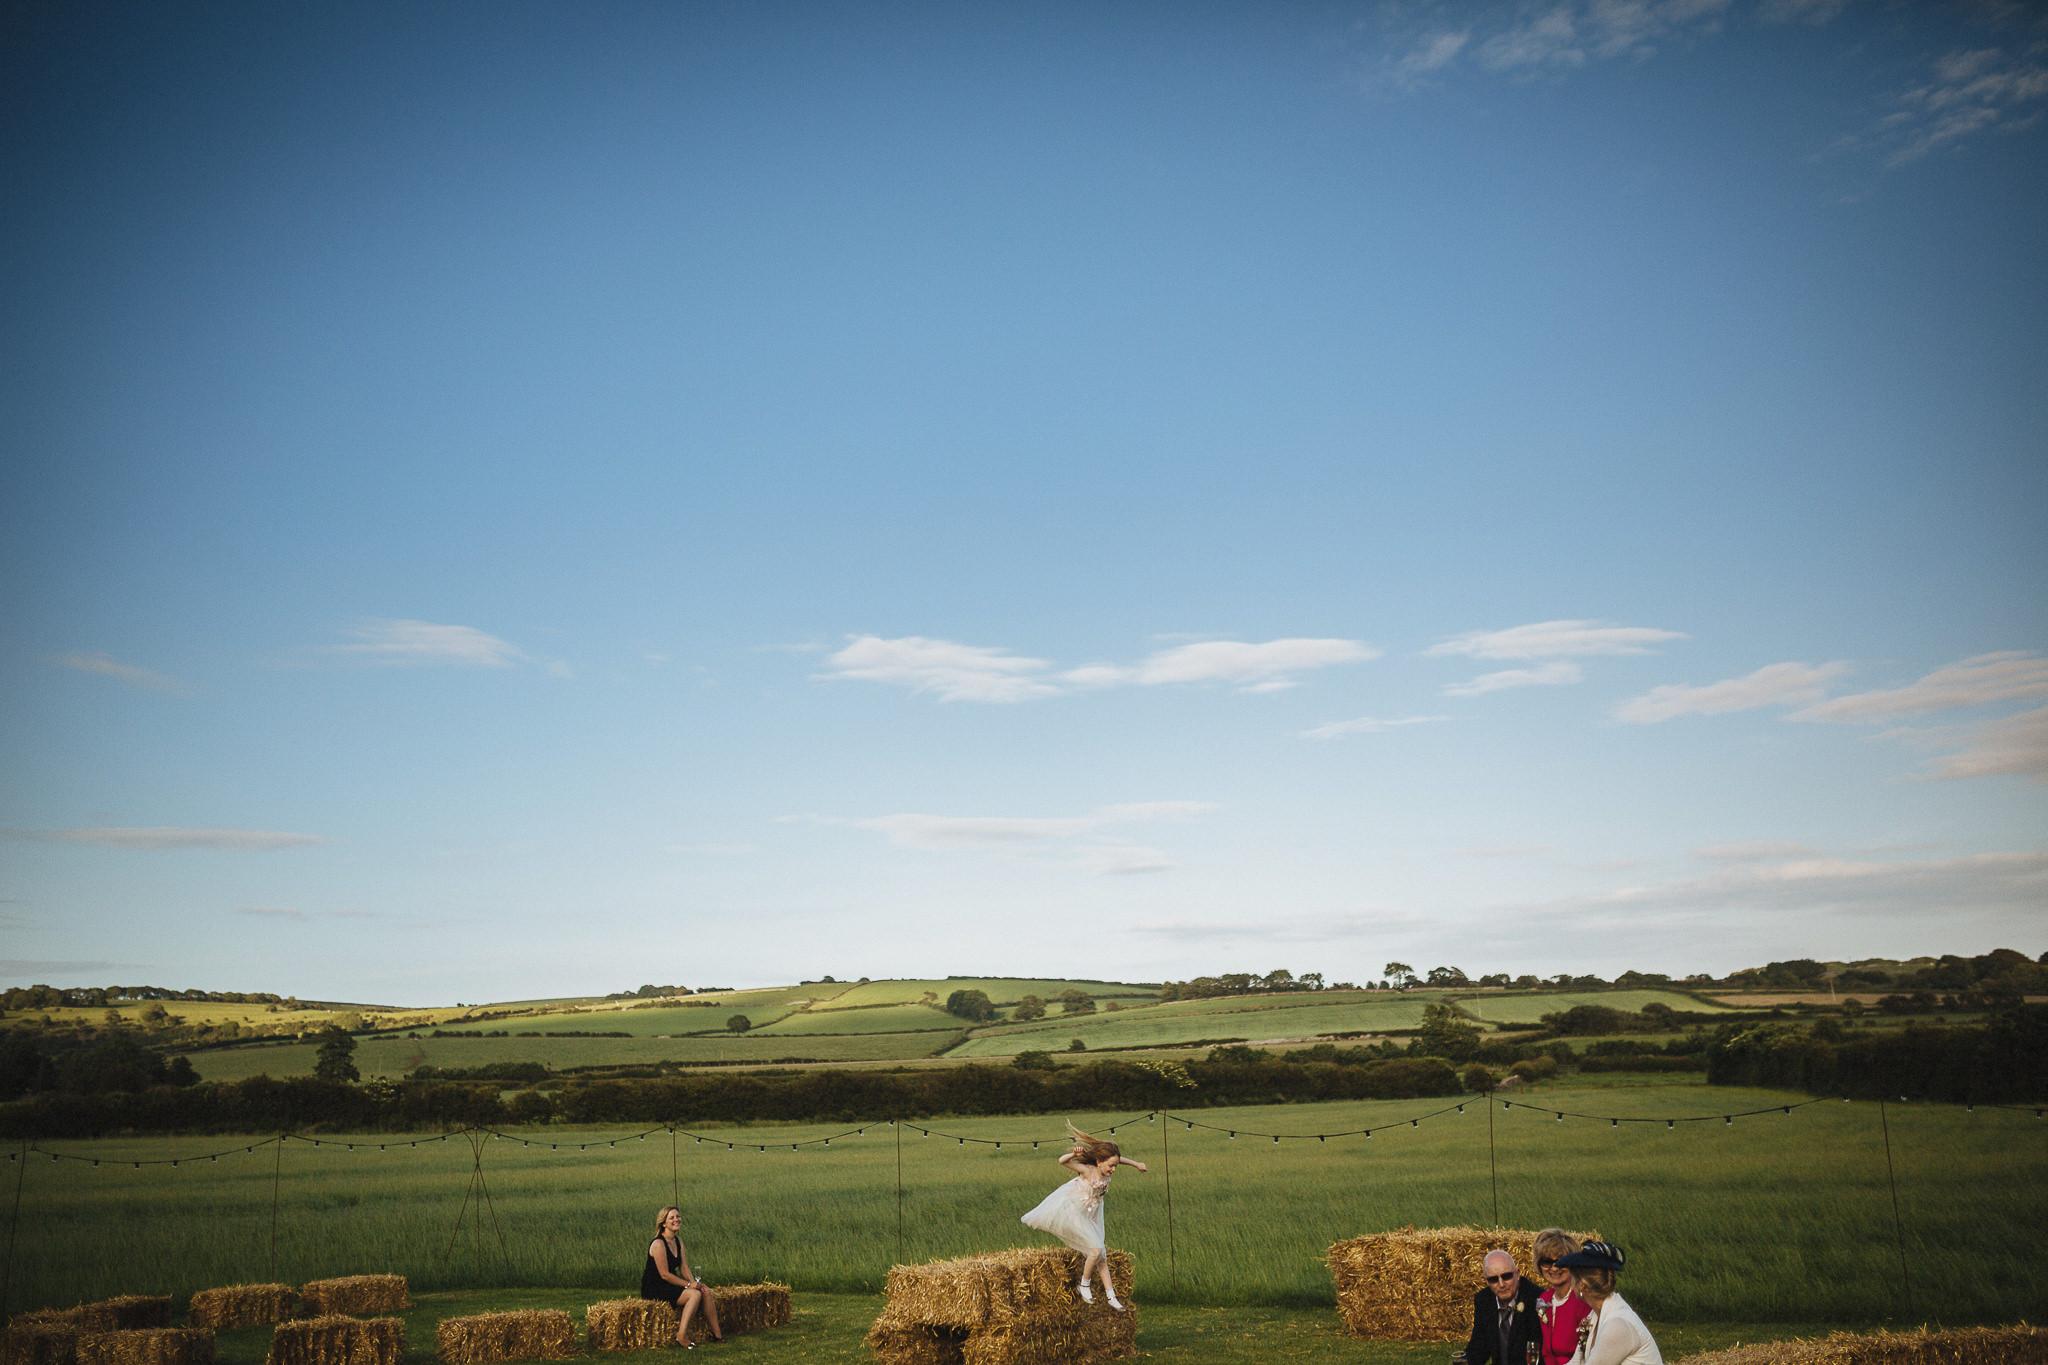 paul-marbrook-Farm-Wedding-Photographer-Lancashire-90080